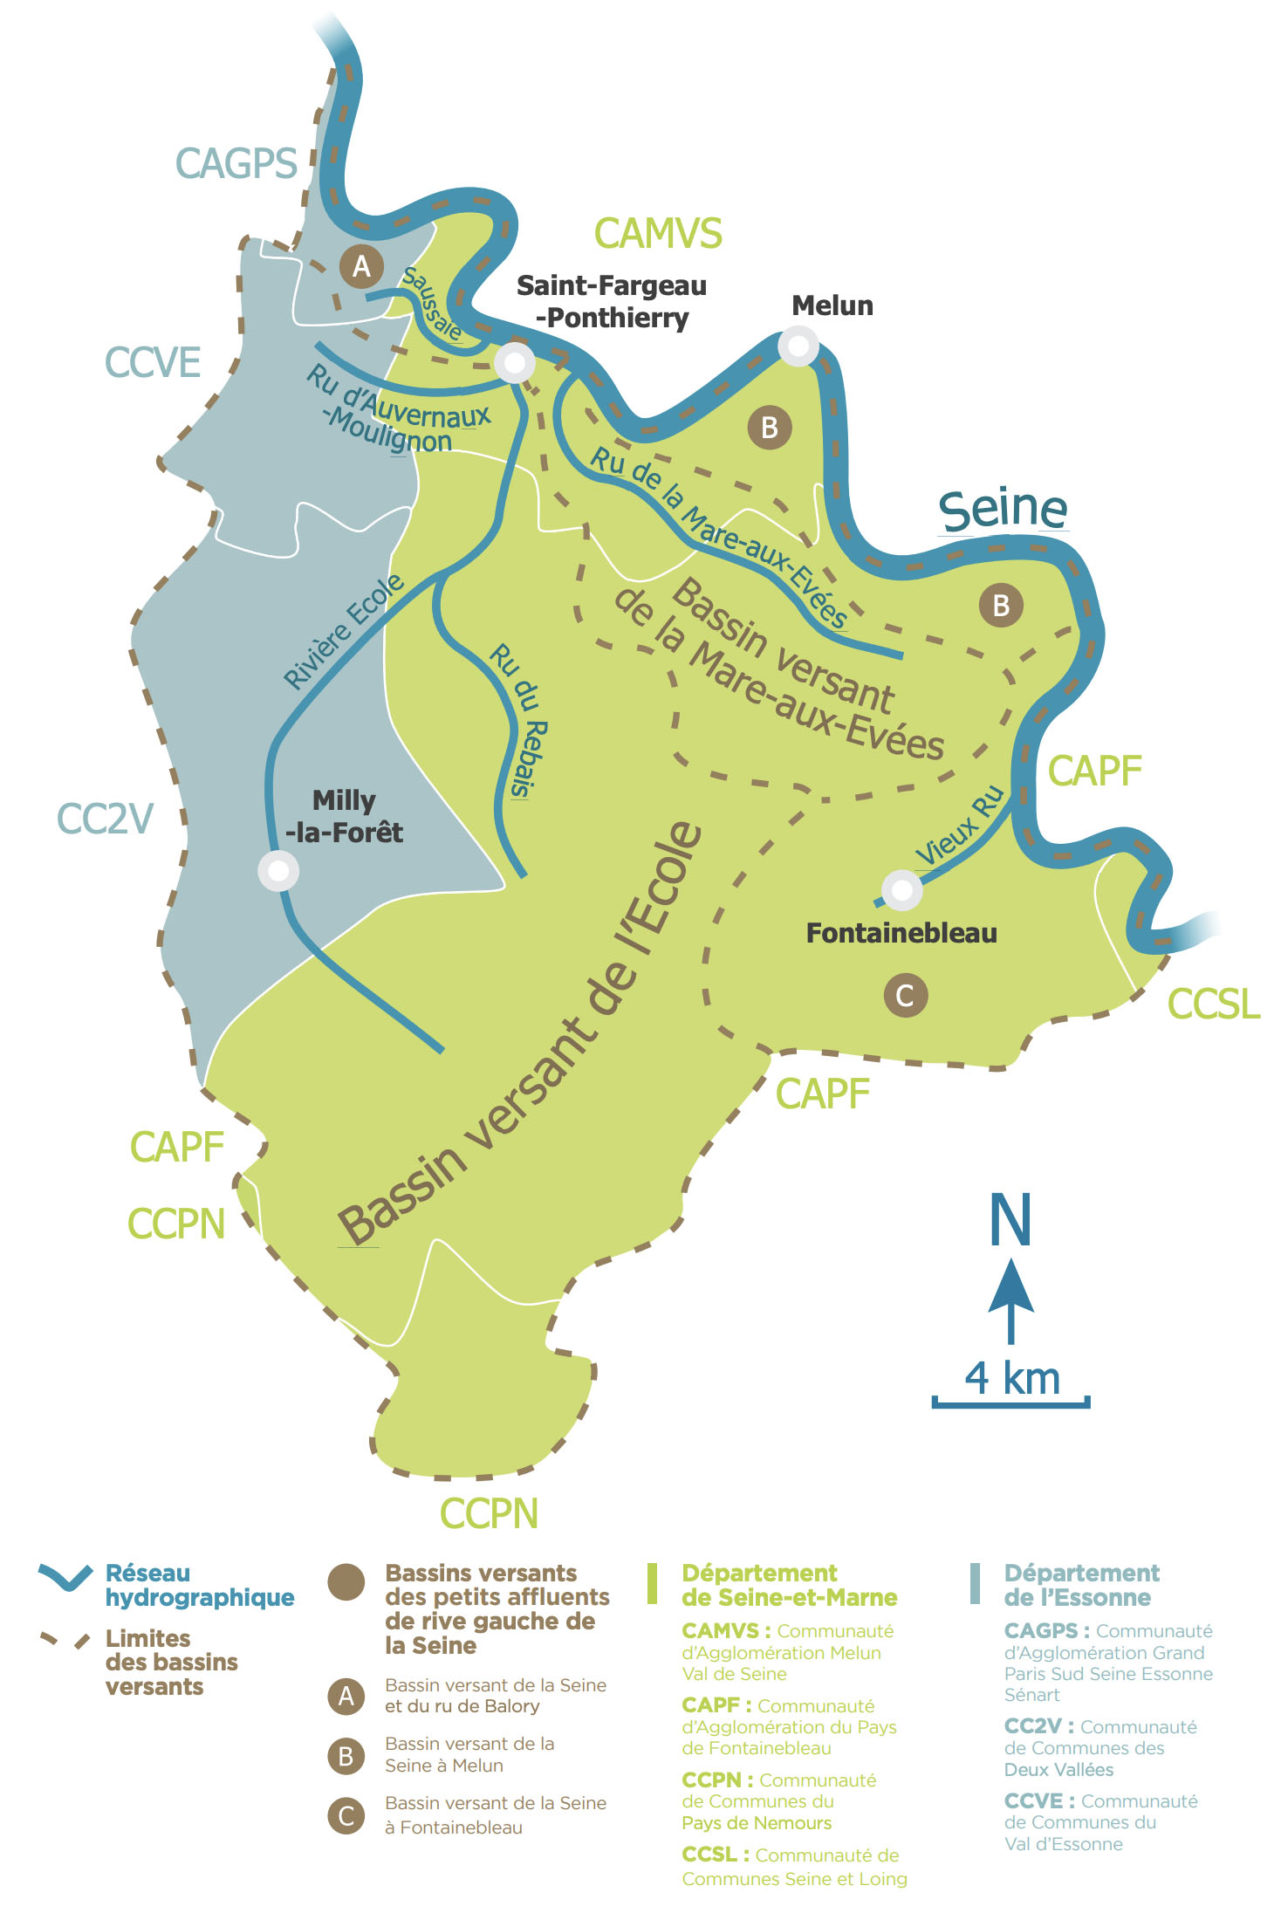 Les cinq bassins versants en quelques chiffres